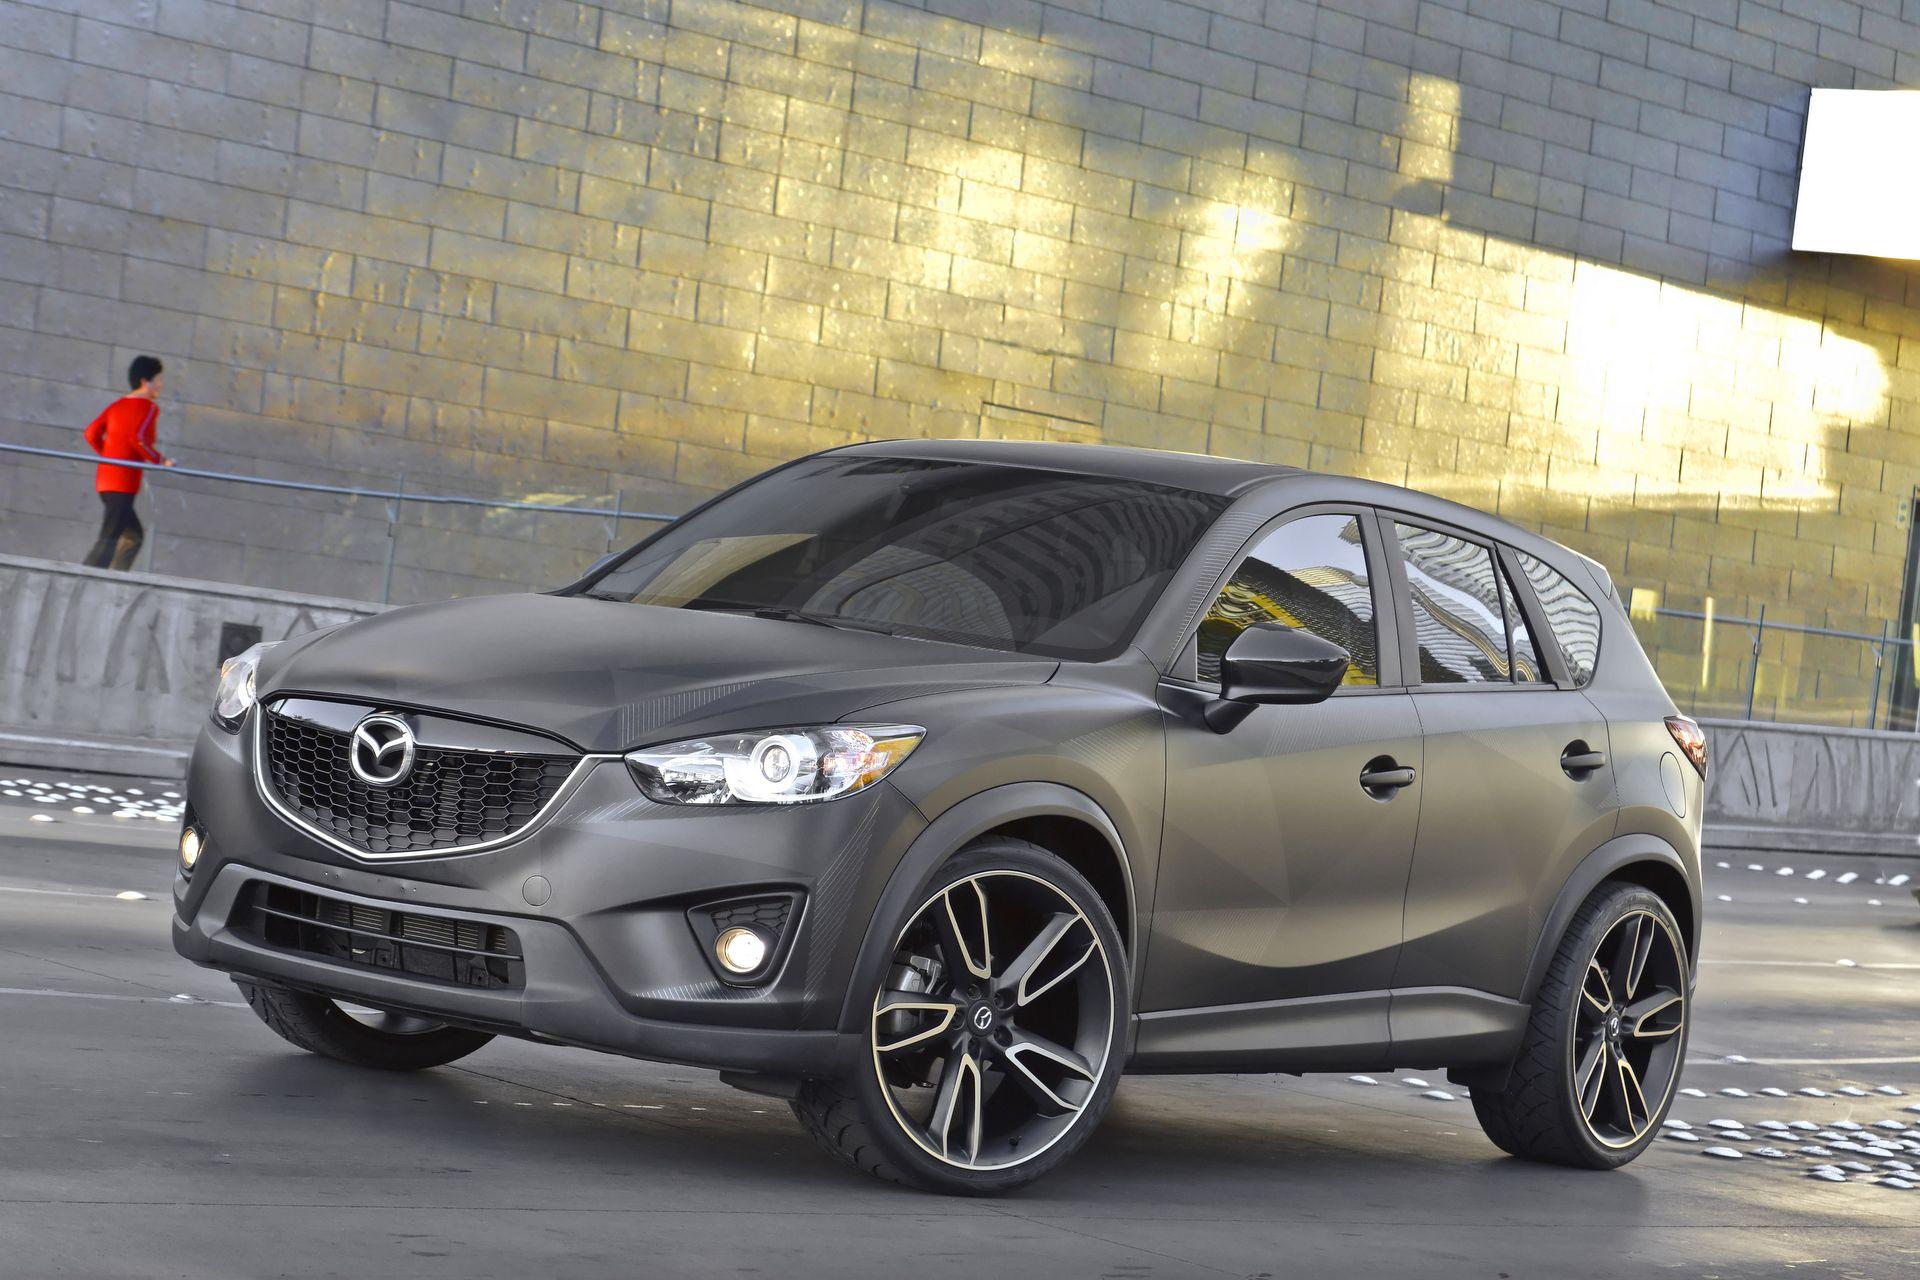 Custom Mazda CX-5 Urban Unveiled at SEMA 2012 - ForceGT.com